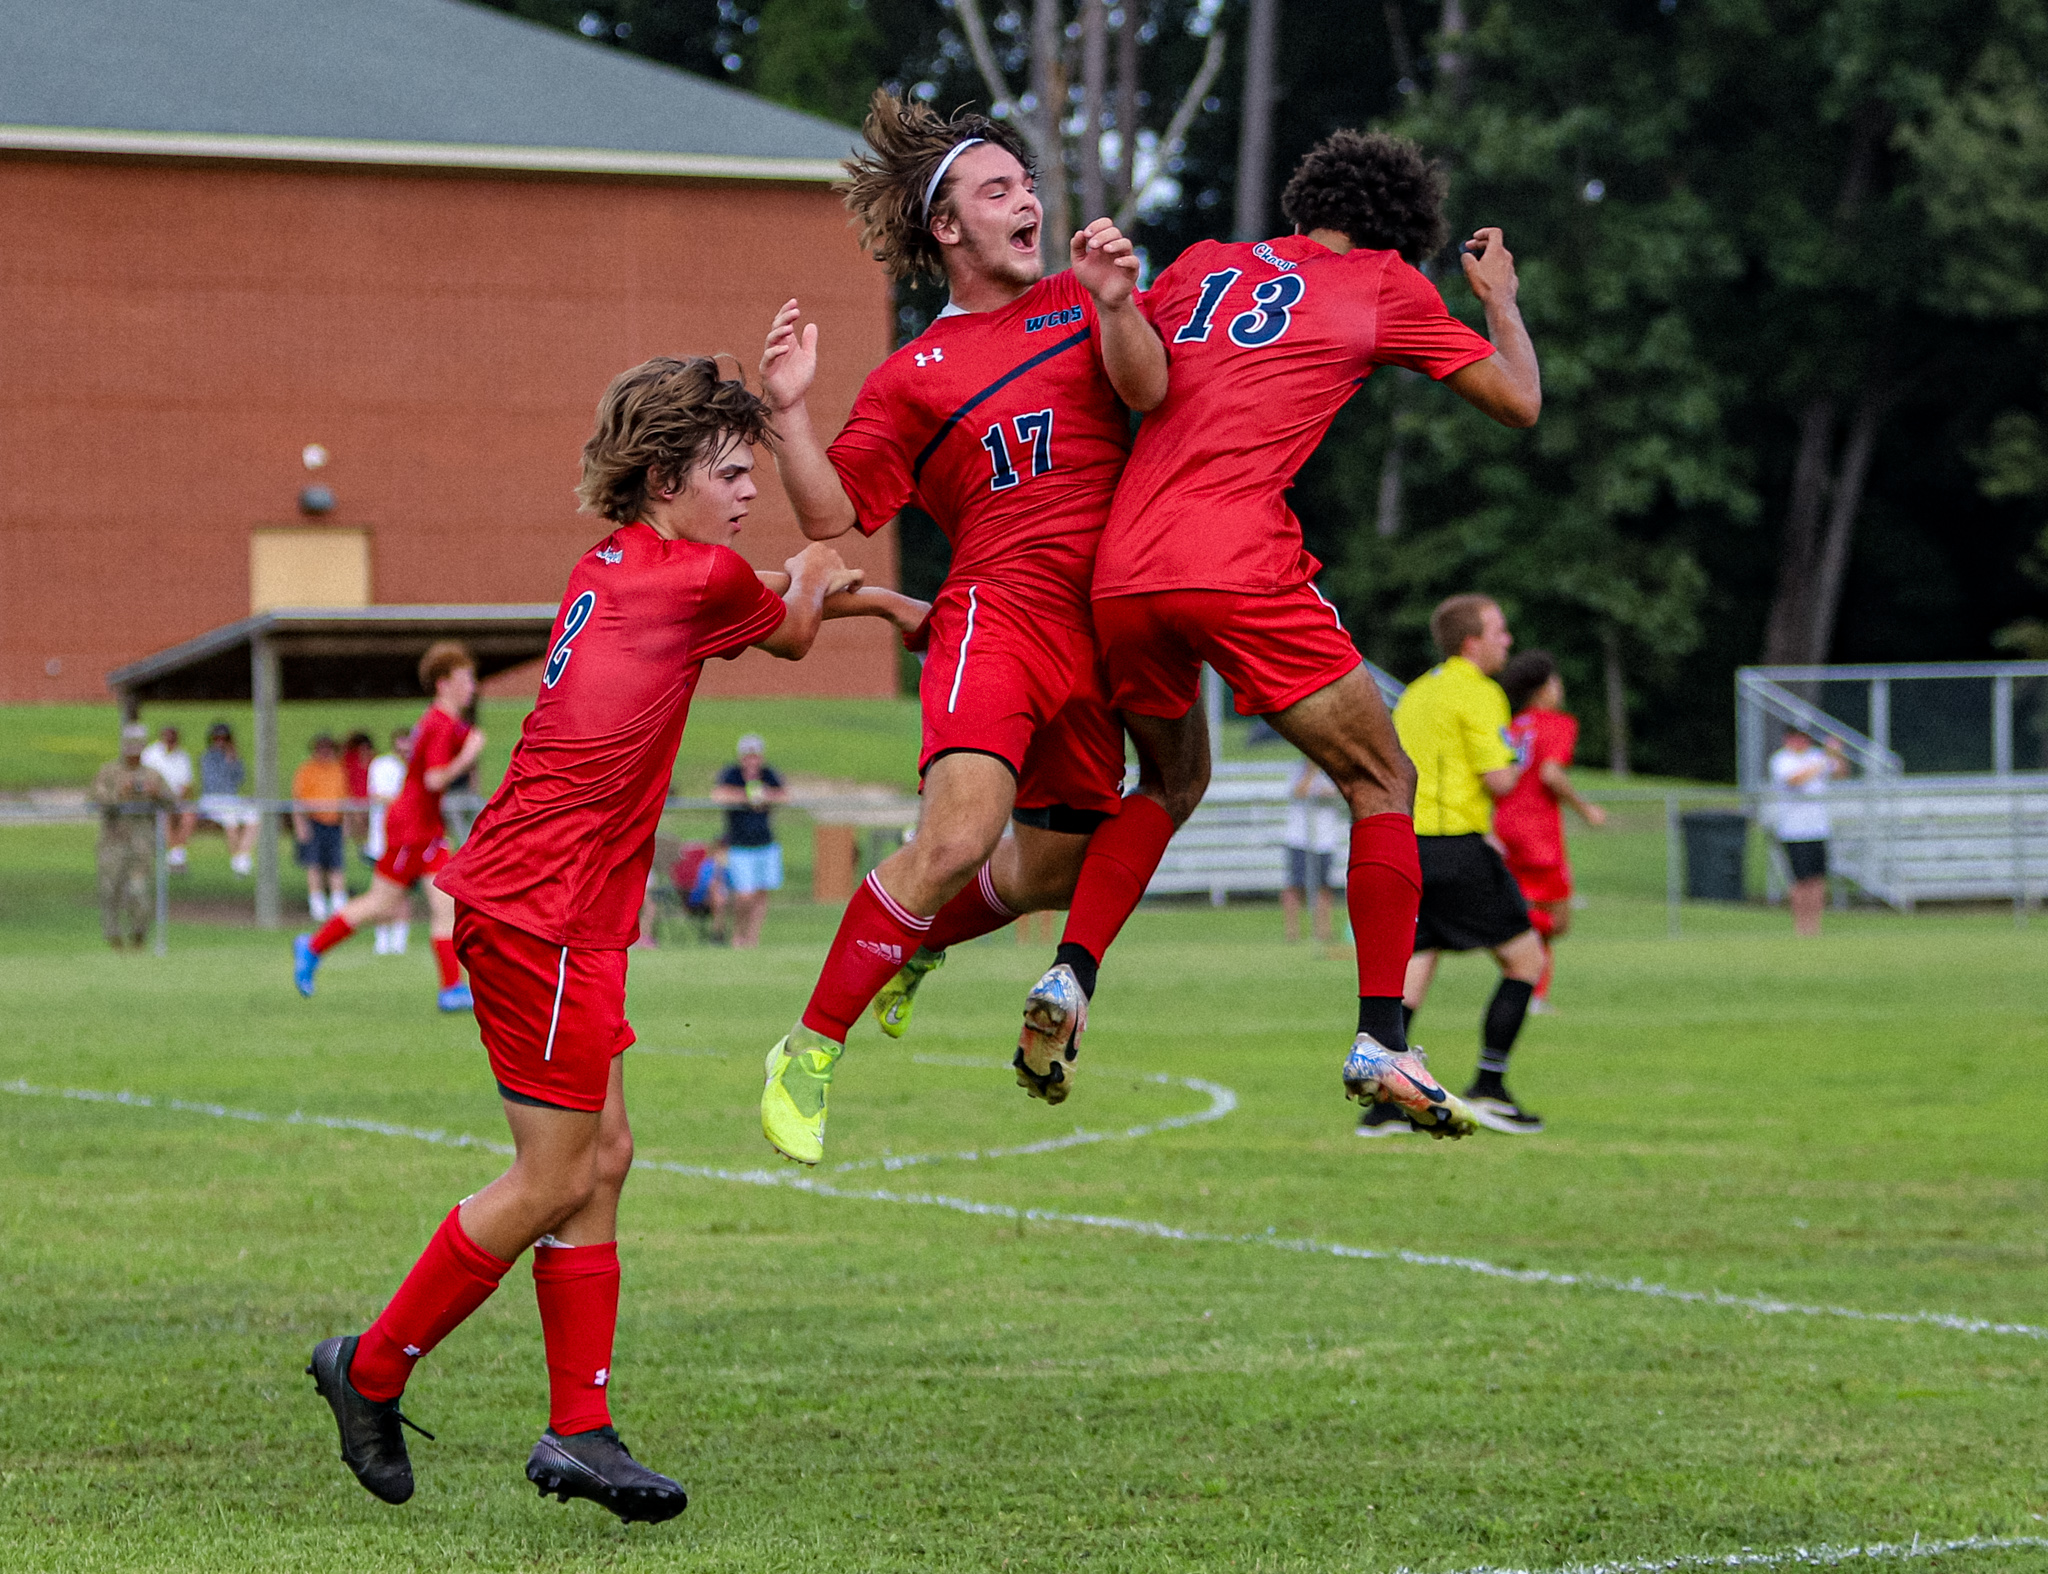 Boys Soccer: Wayne Country Day Wins Season Opener Against Neuse Christian Academy (PHOTO GALLERY)